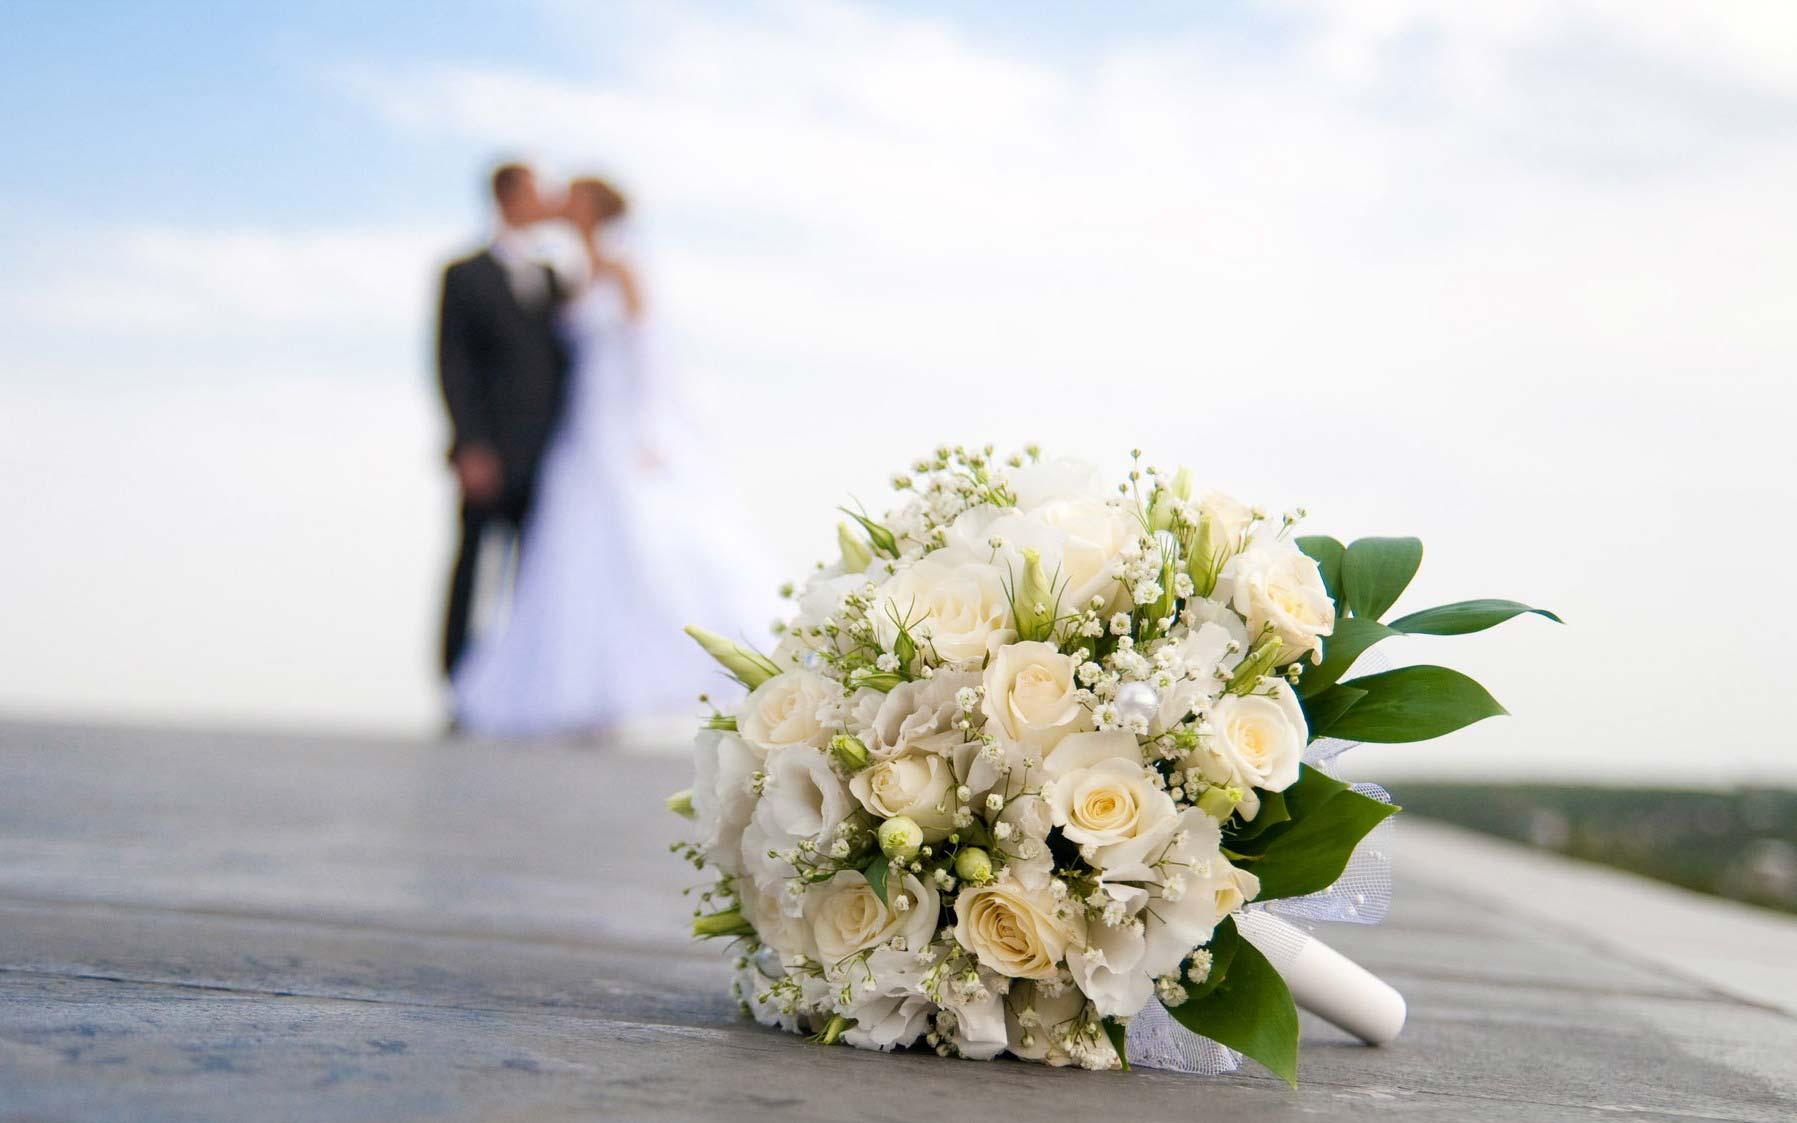 Dpcm 2021 regole per matrimoni, funerali e feste